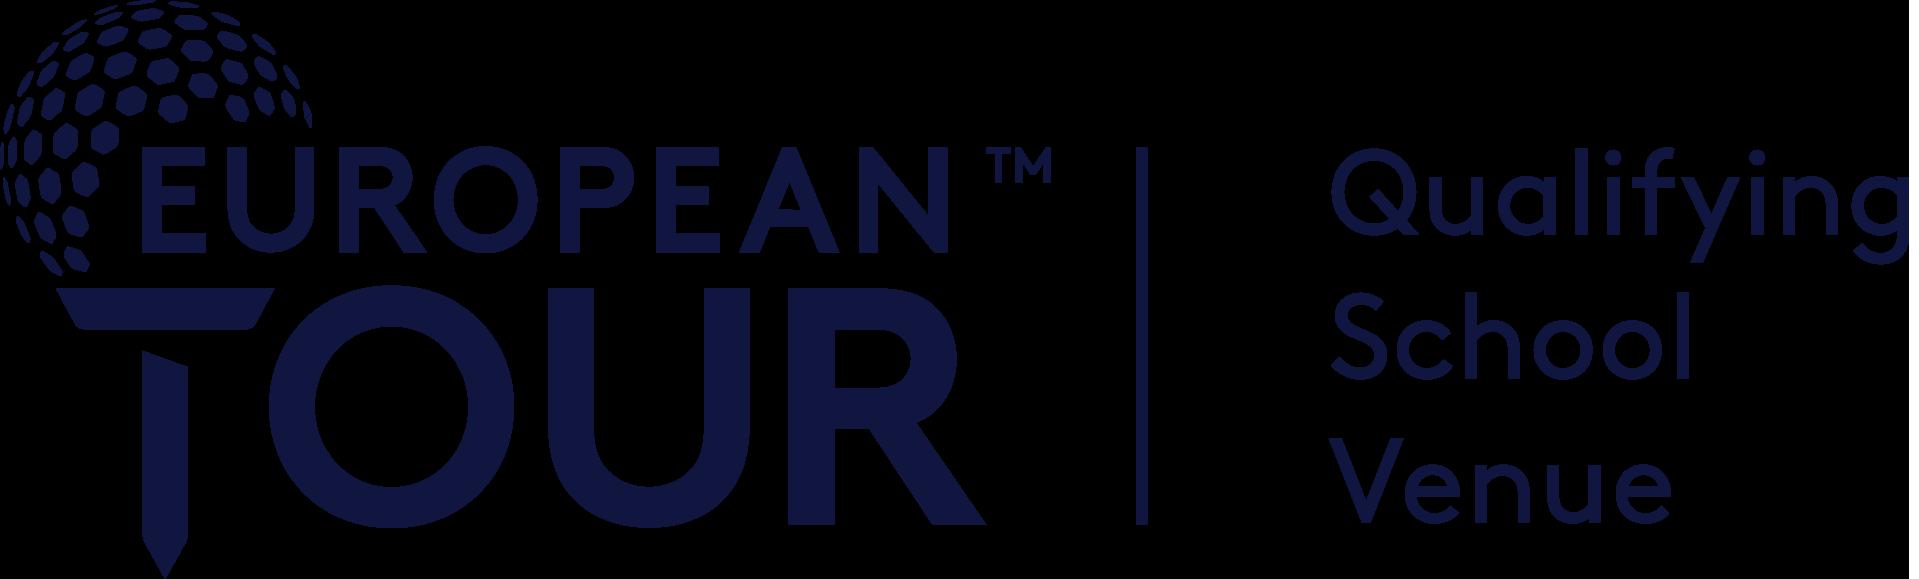 European Tour Qualifying School Venue Logo